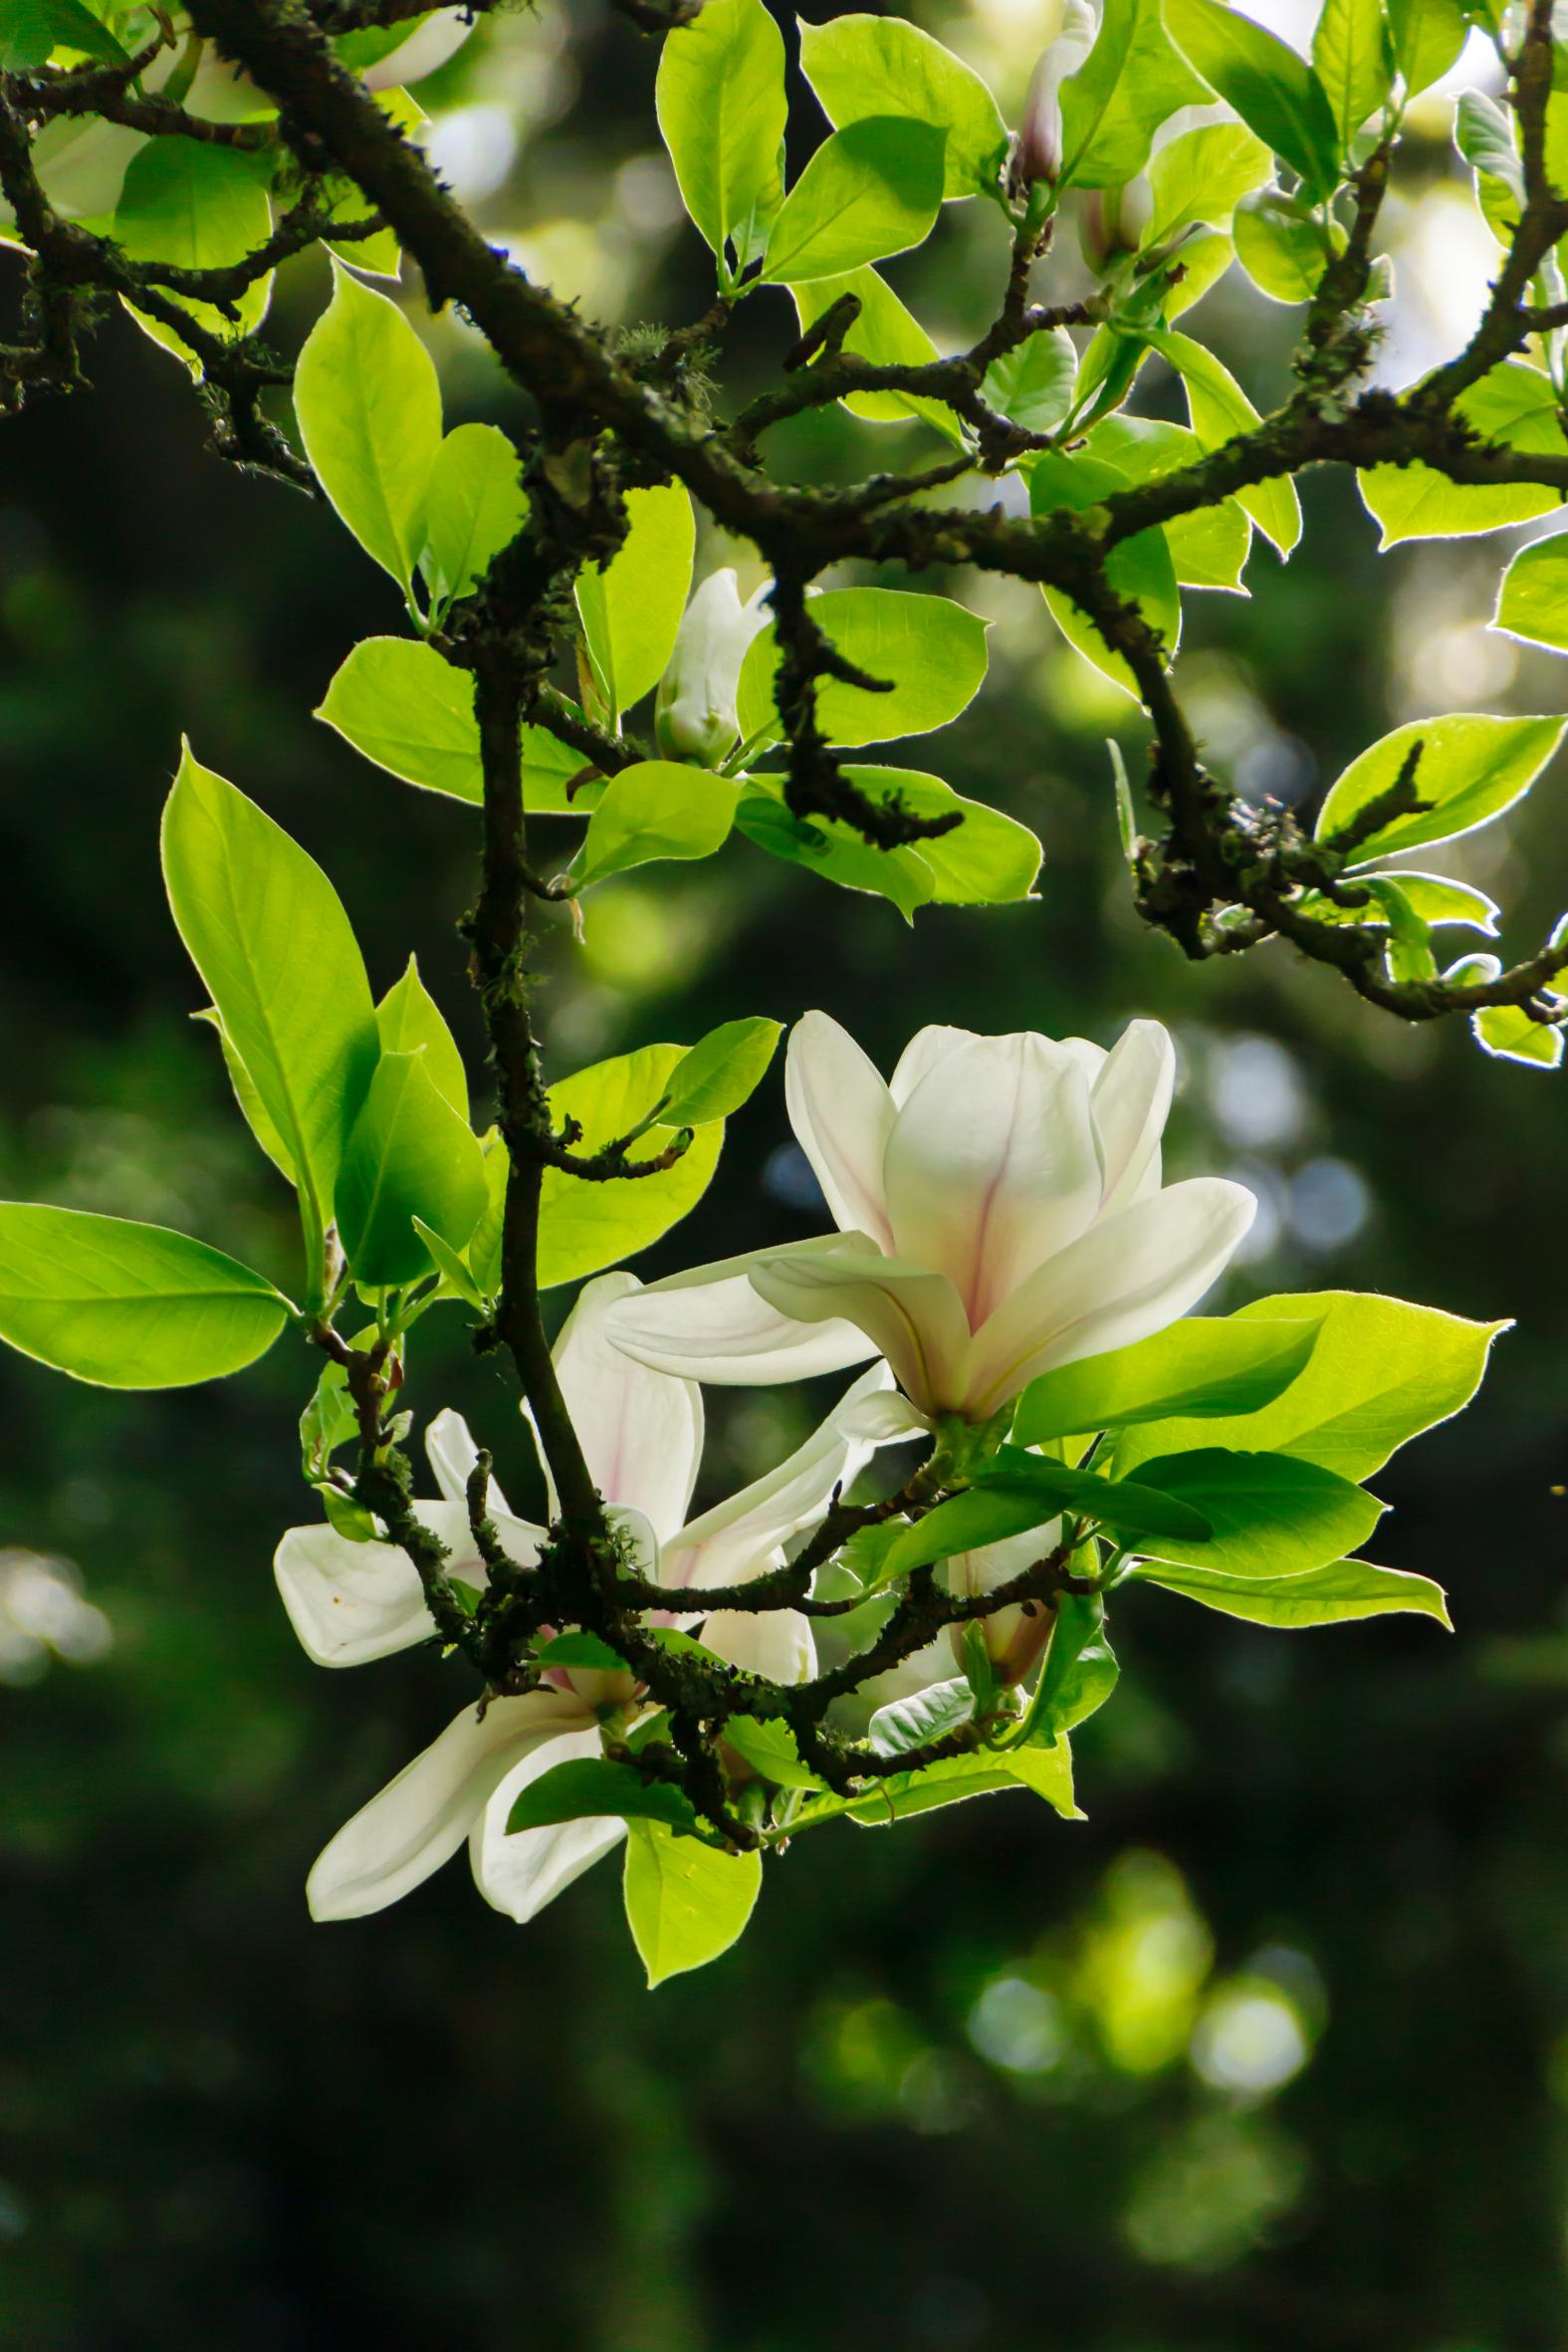 Magnolien: Edle Blüten aus Fernost